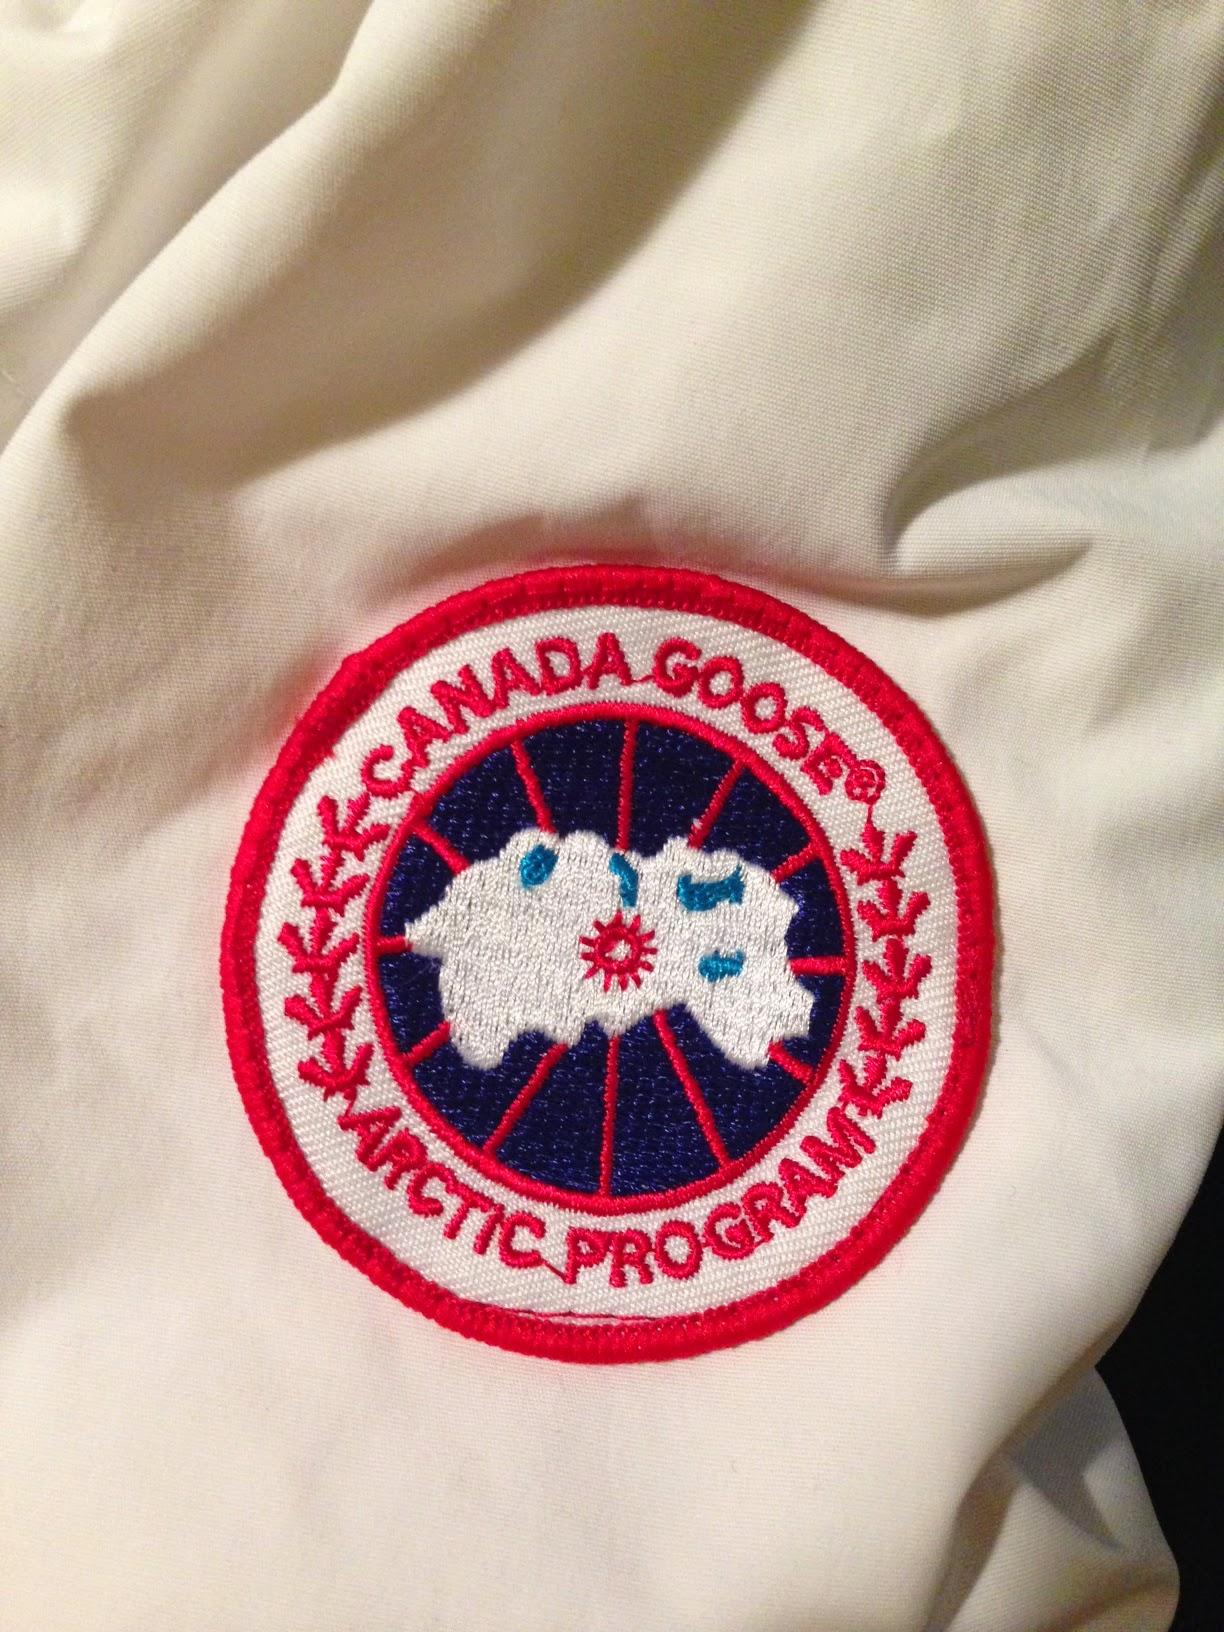 Canada Goose' fake lottery